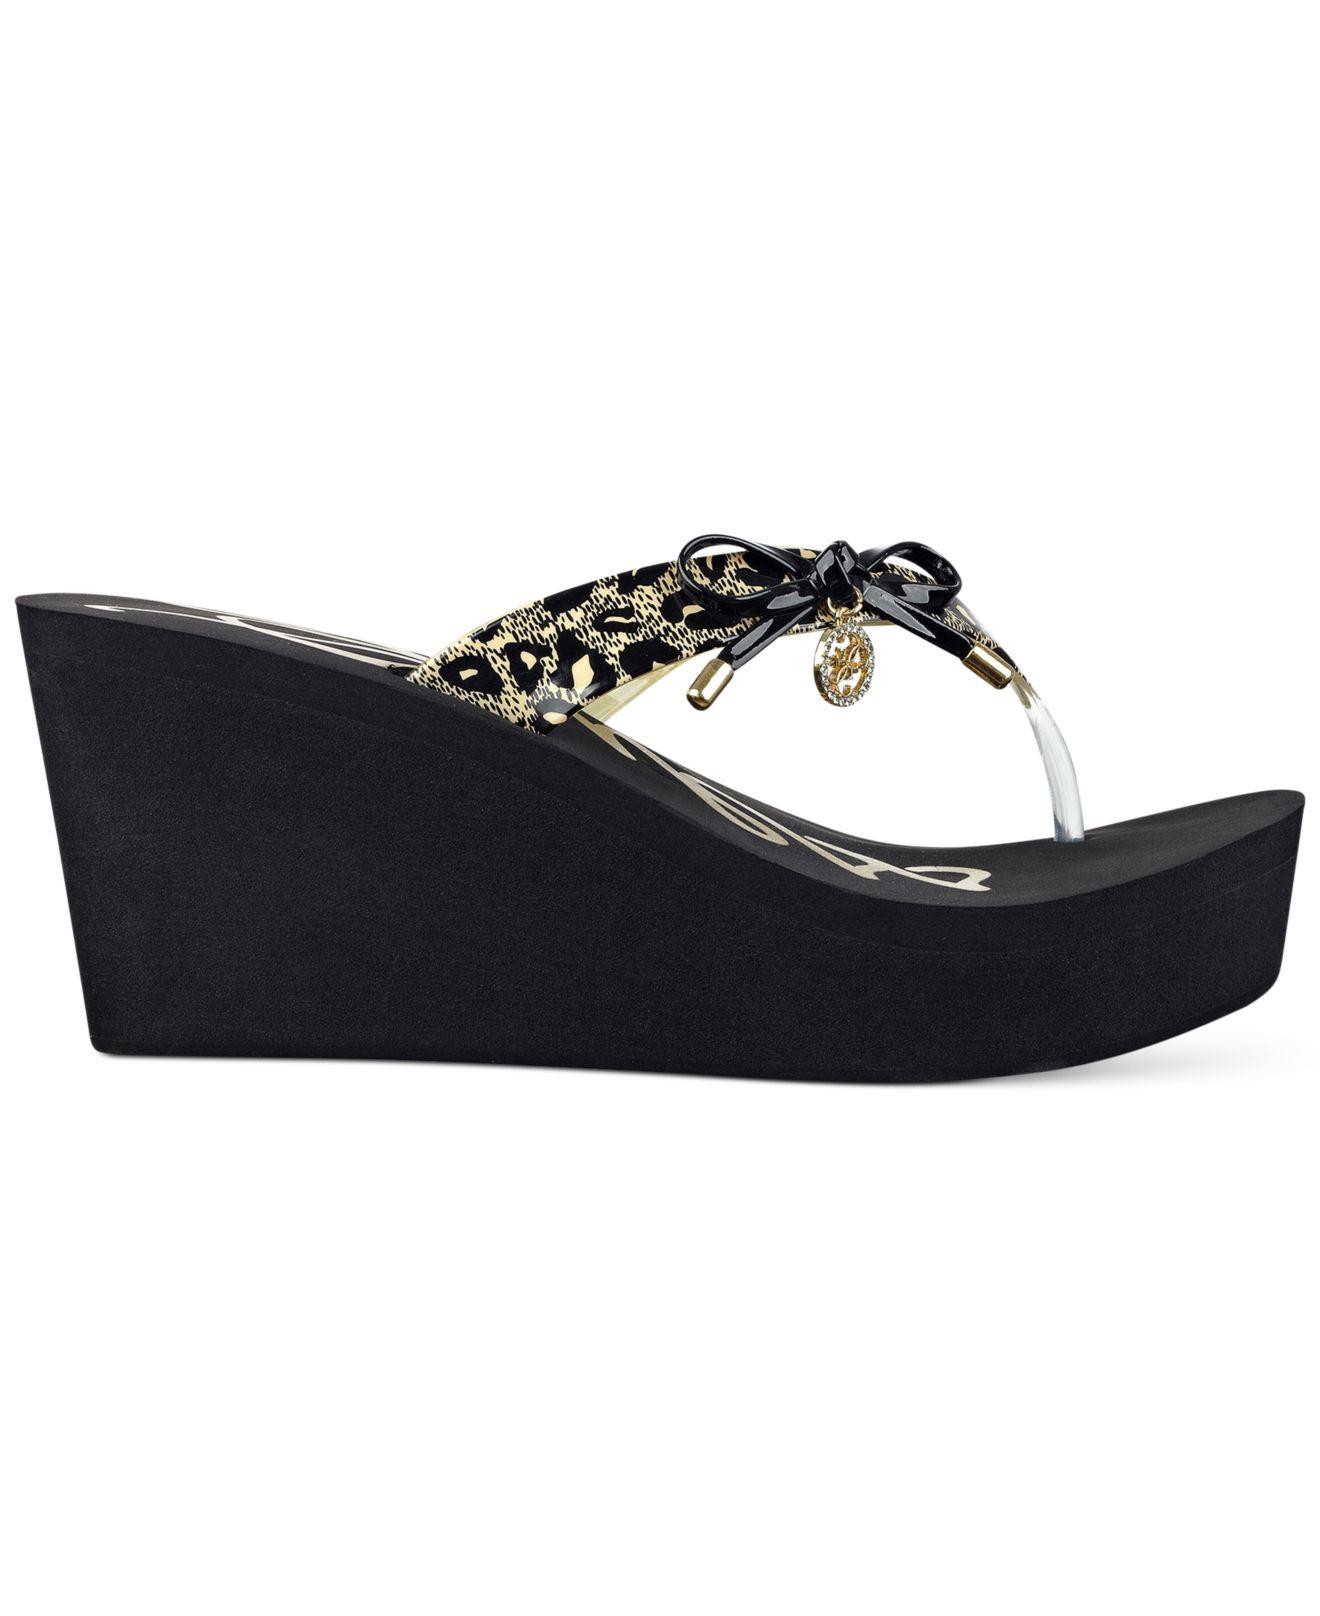 6d766cc9fb77 Lyst - Guess Women s Safire Wedge Flip Flop Sandal in Black